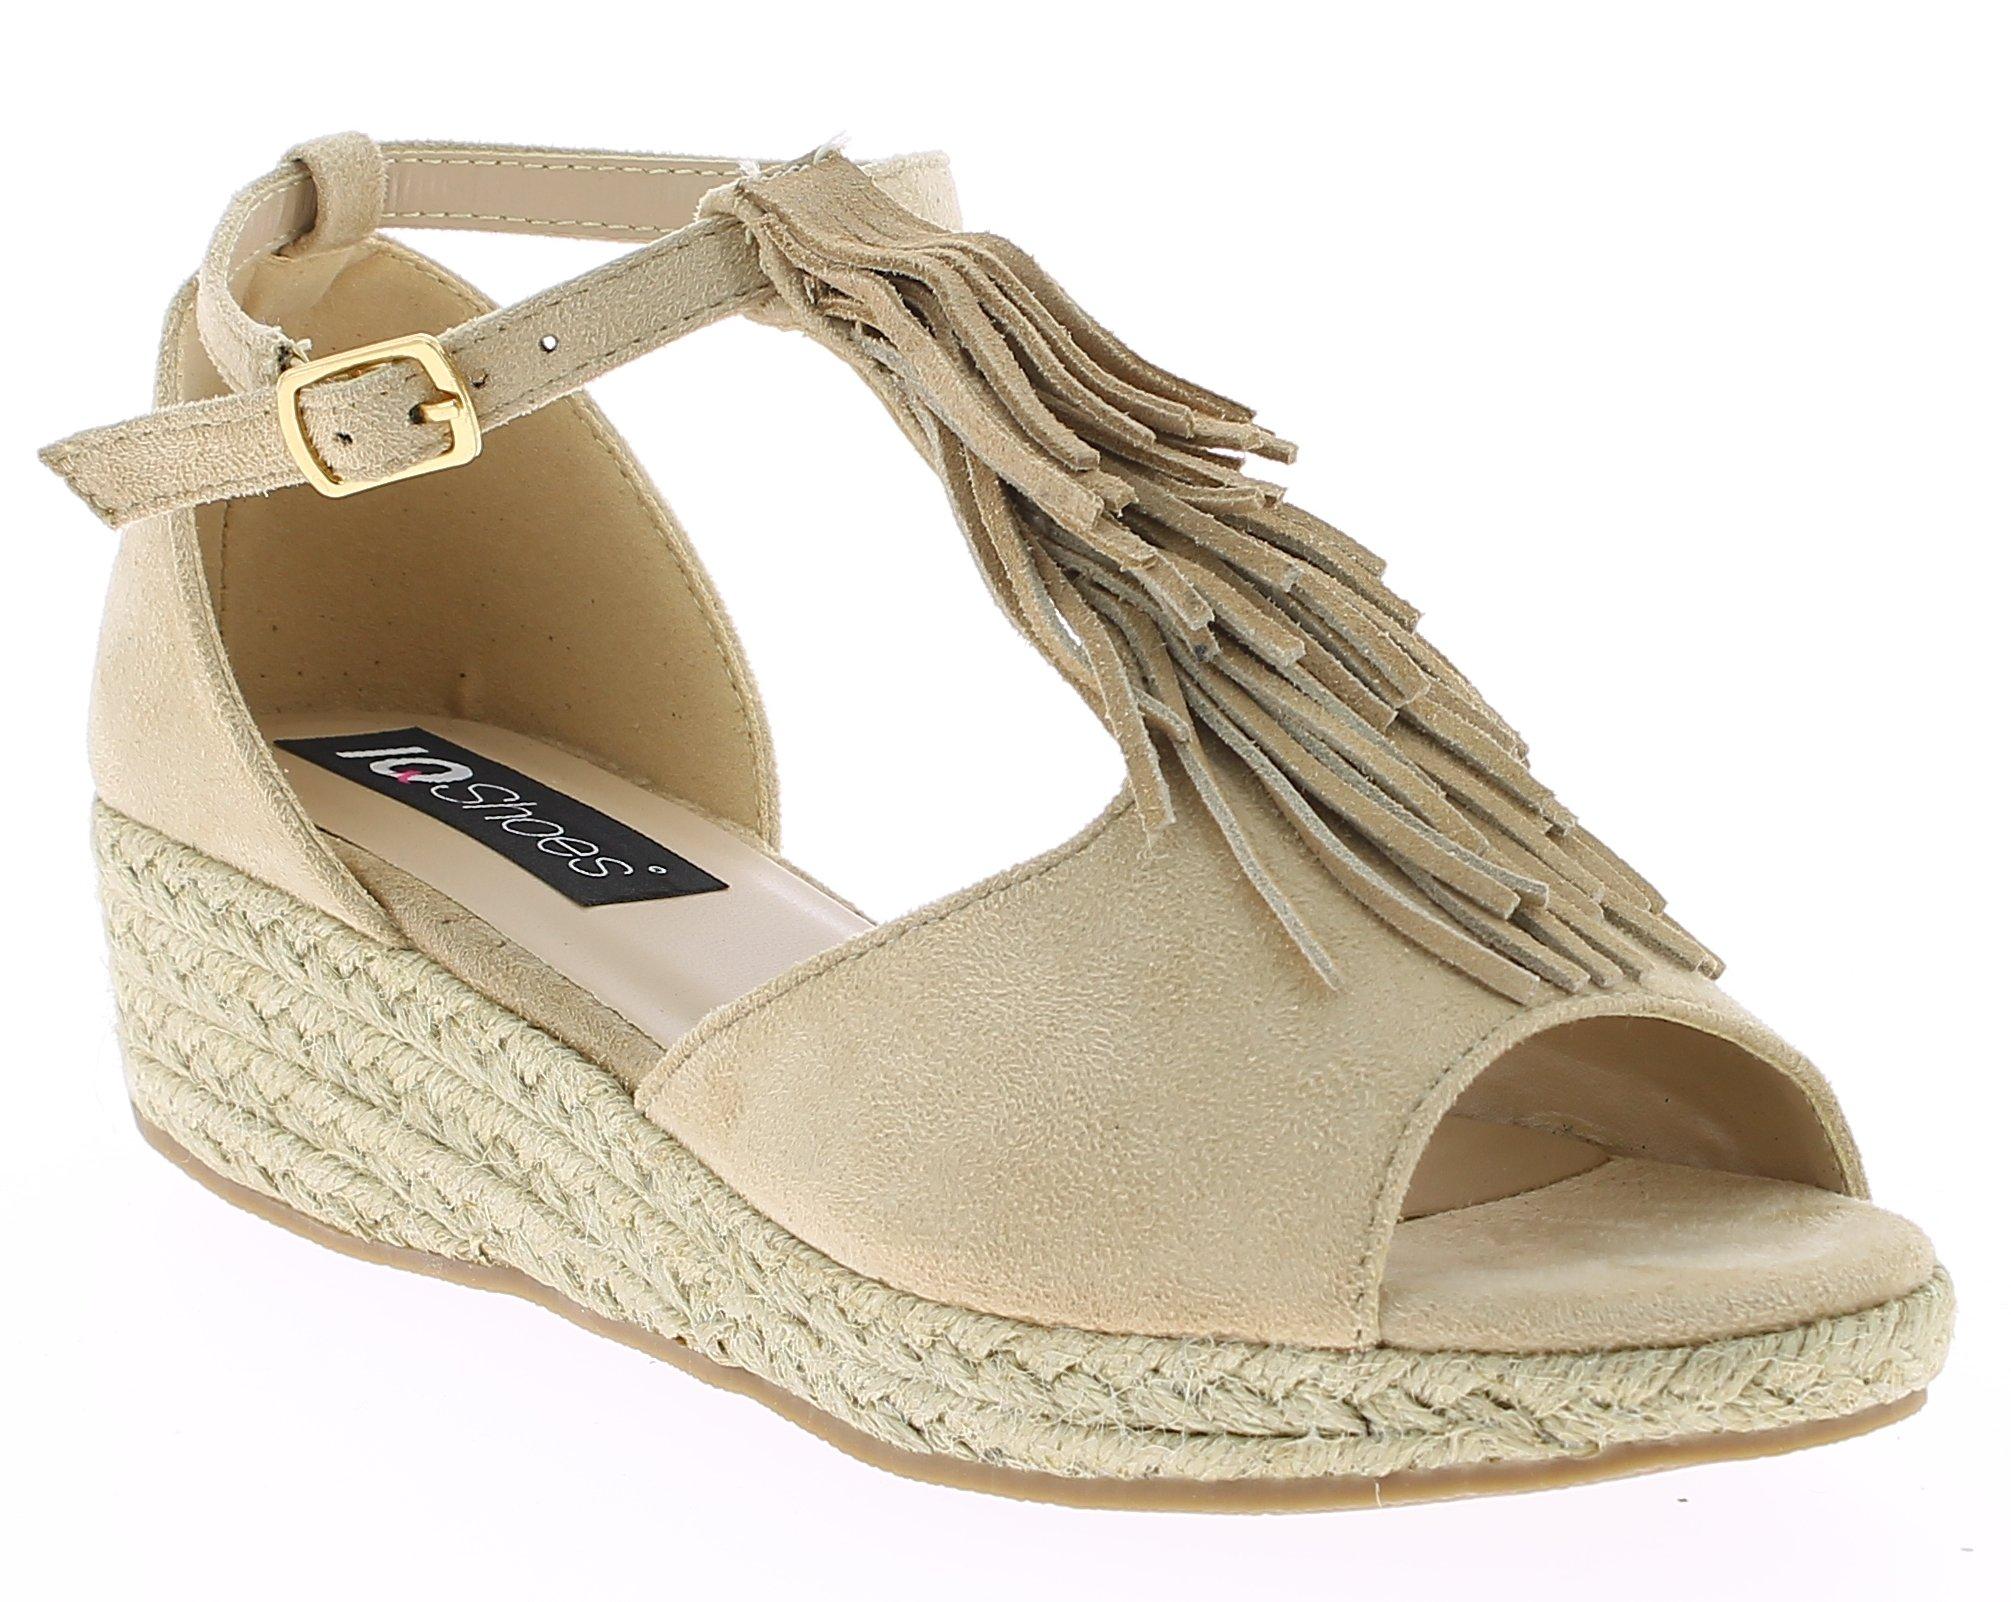 IQSHOES Γυναικείο Πέδιλο 3H048 Μπεζ - IqShoes - 18.3H048 BEIGE-IQSHOES-beige-37/ παπούτσια  προσφορεσ